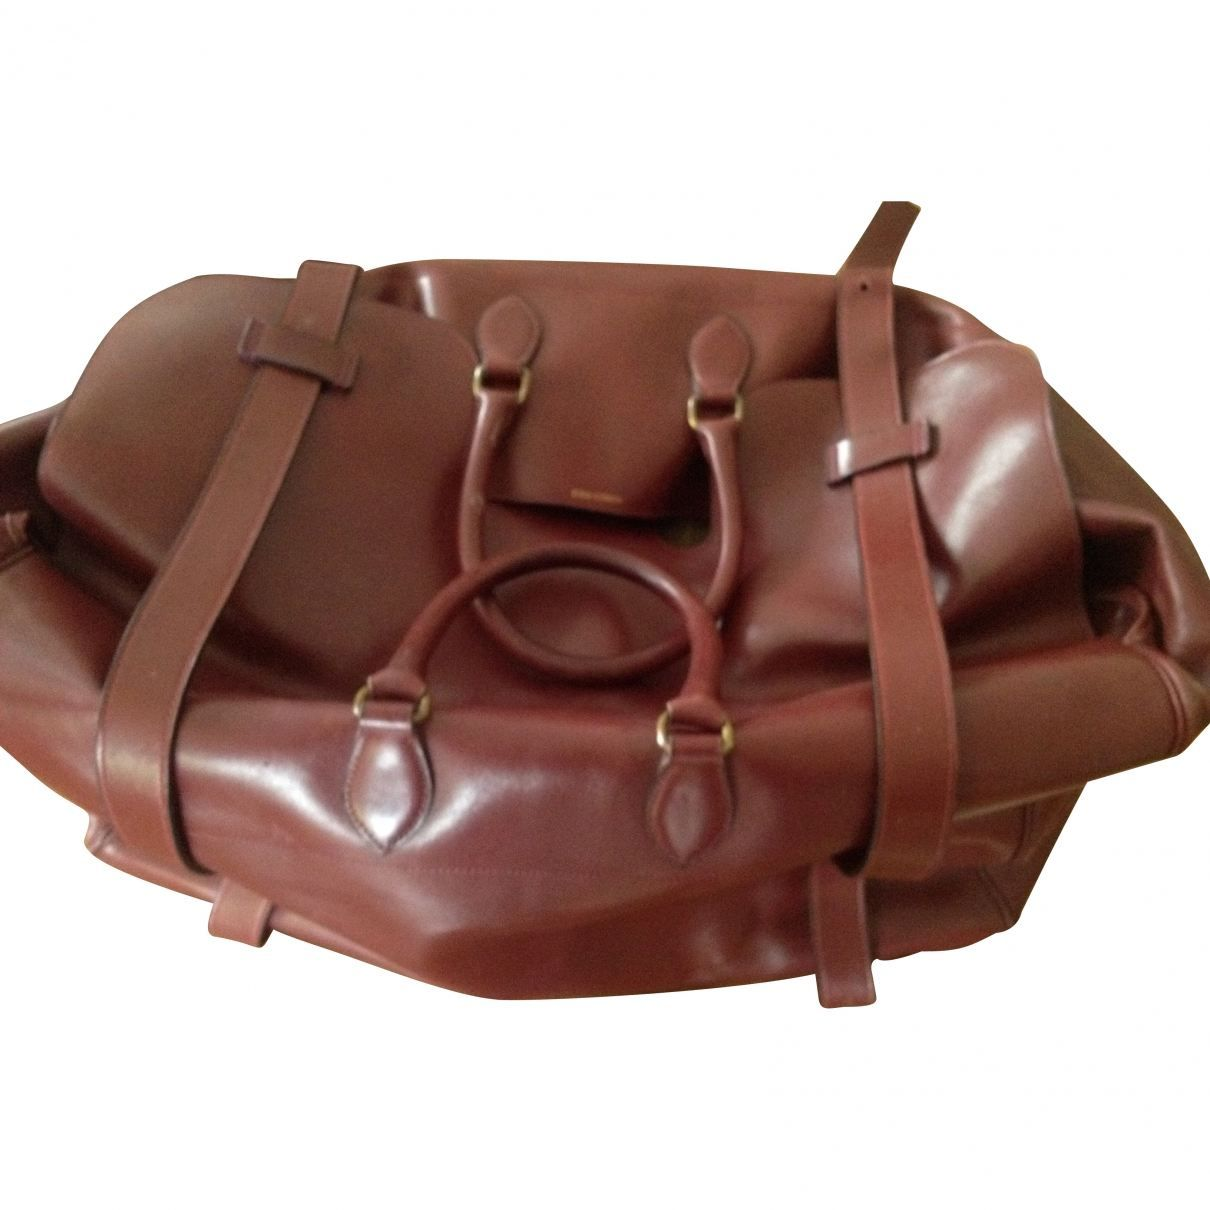 HERMÈS Burgundy Leather Bag